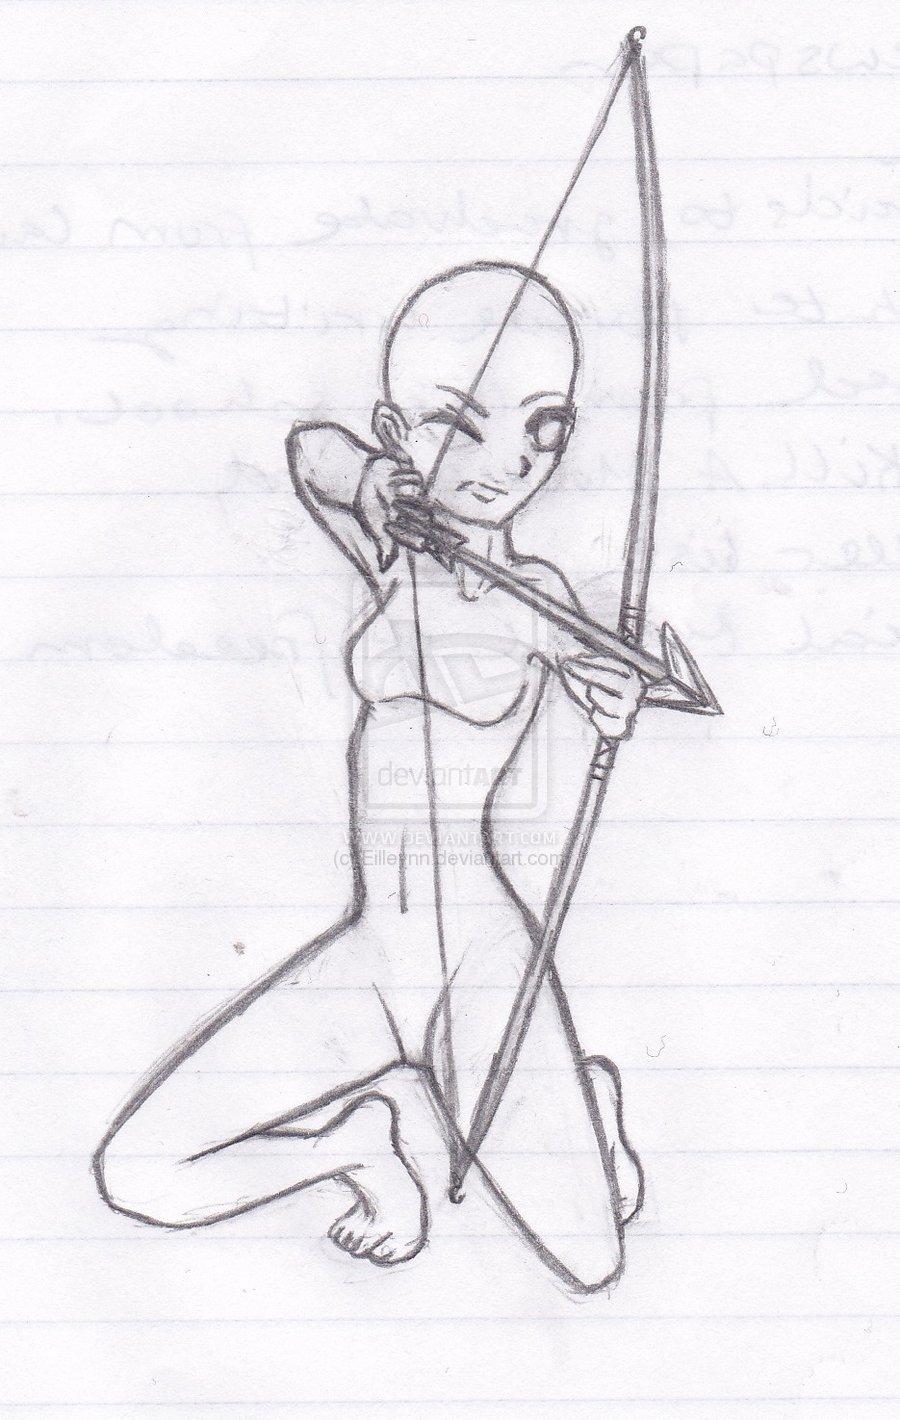 Drawn figurine female archer Draw Definetely archery character An